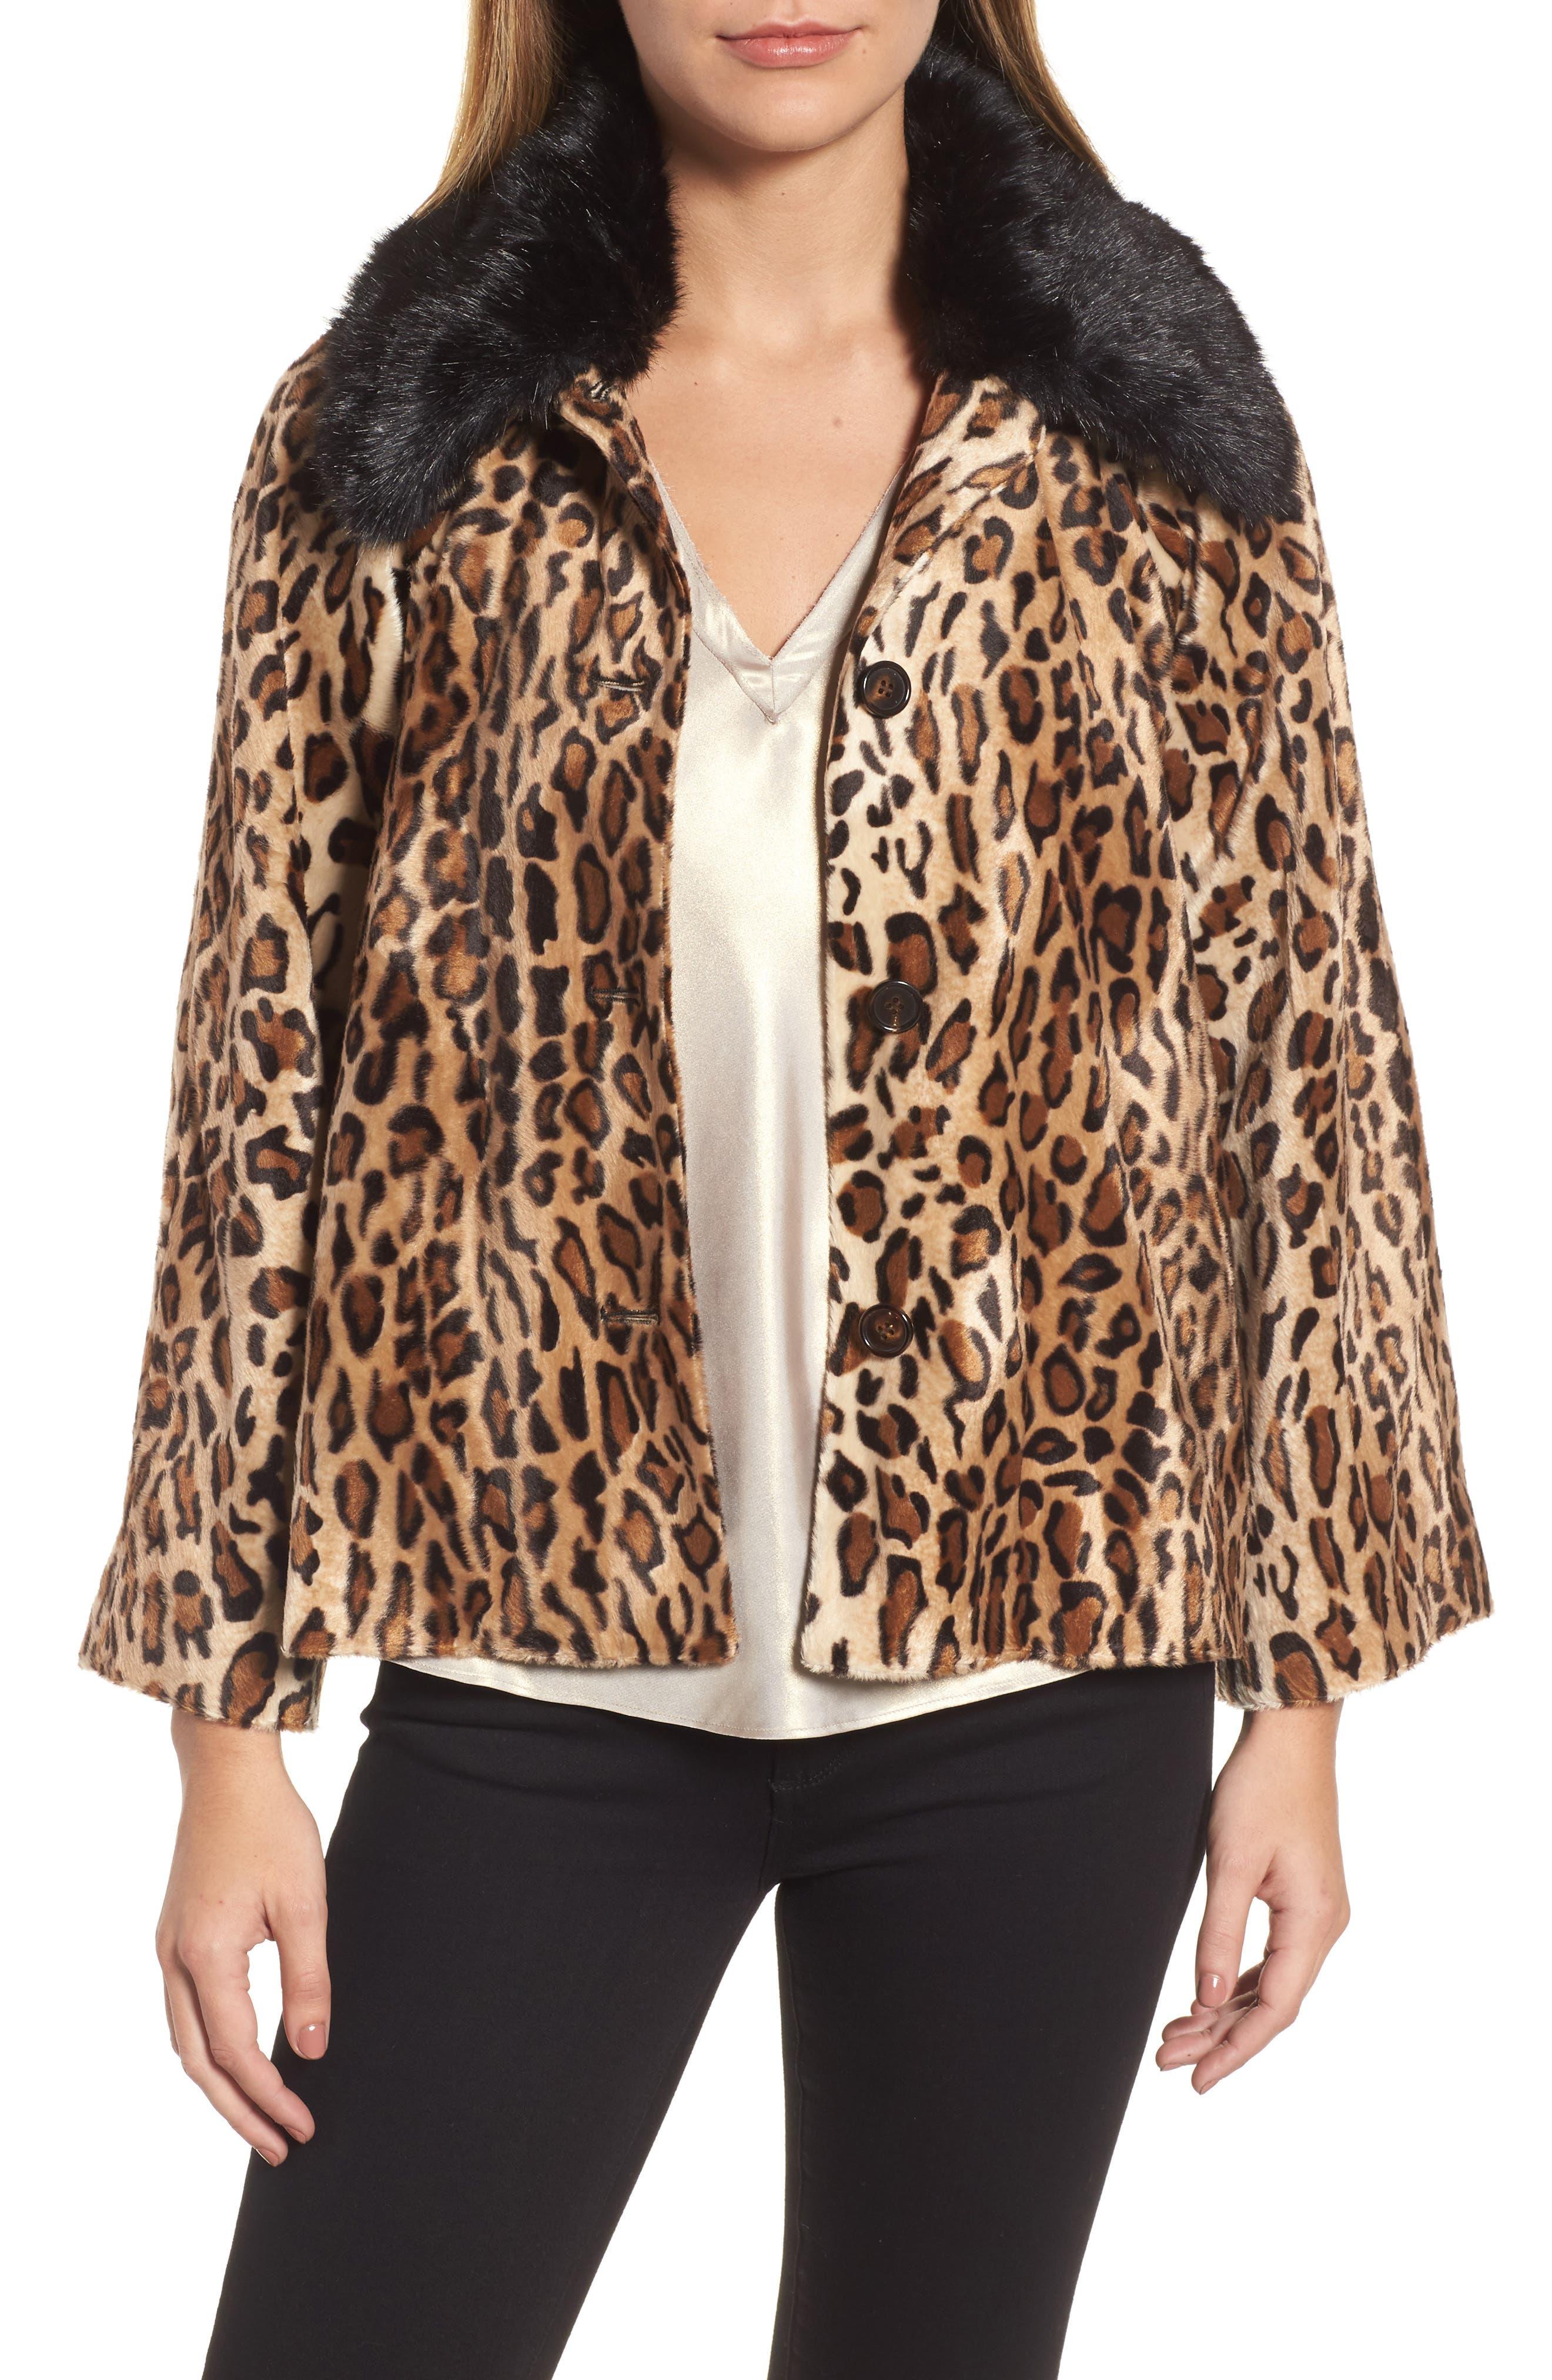 Velvet by Graham & Spencer Faux Fur Leopard Jacket